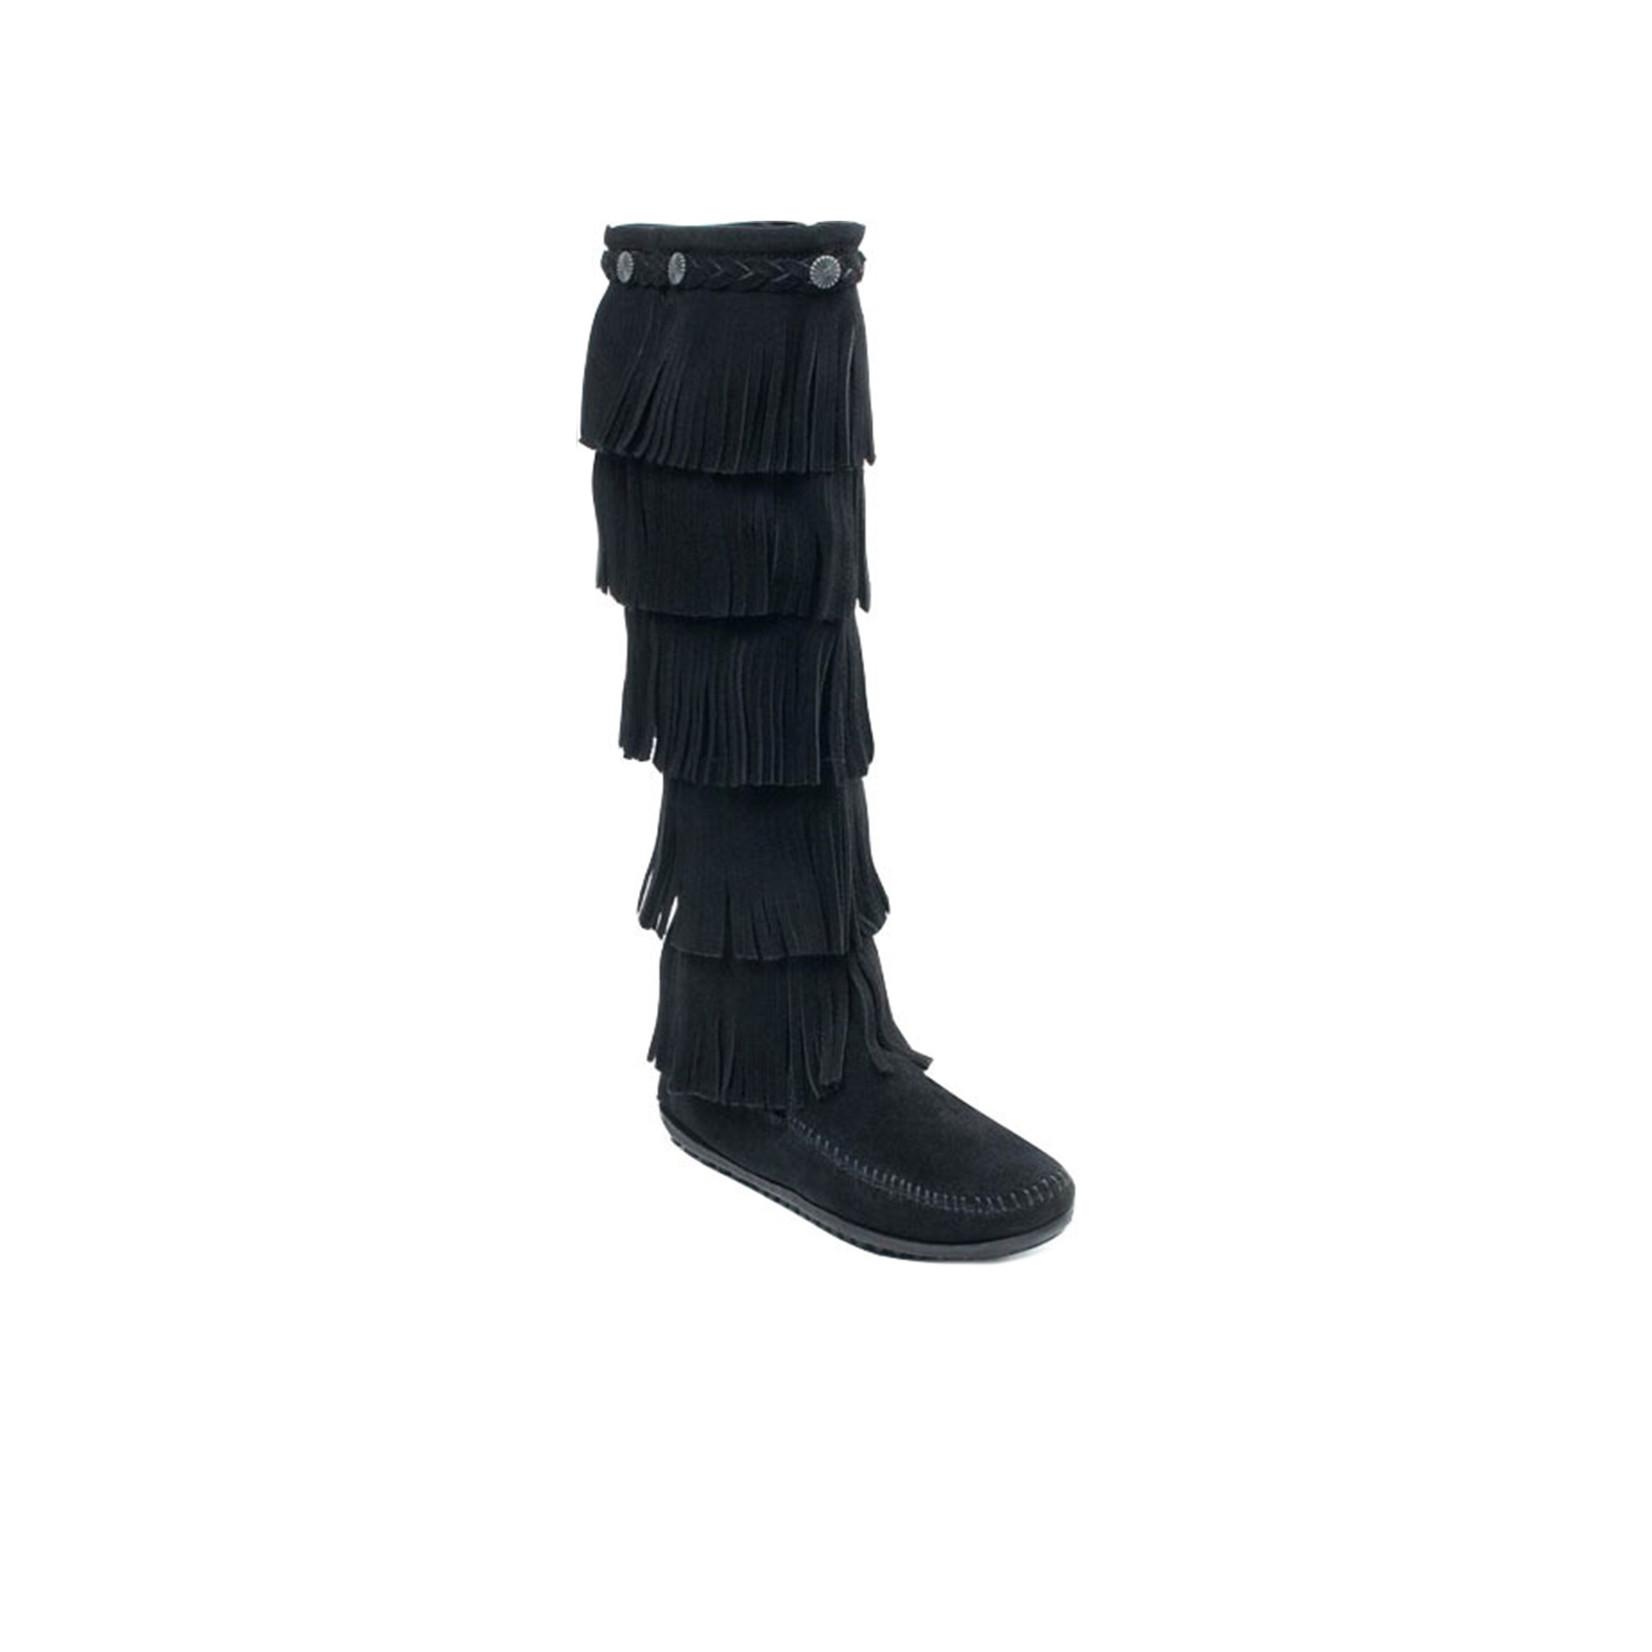 Minnetonka Women's Minnetonka 5 Layer Fringe Boot Black 1659